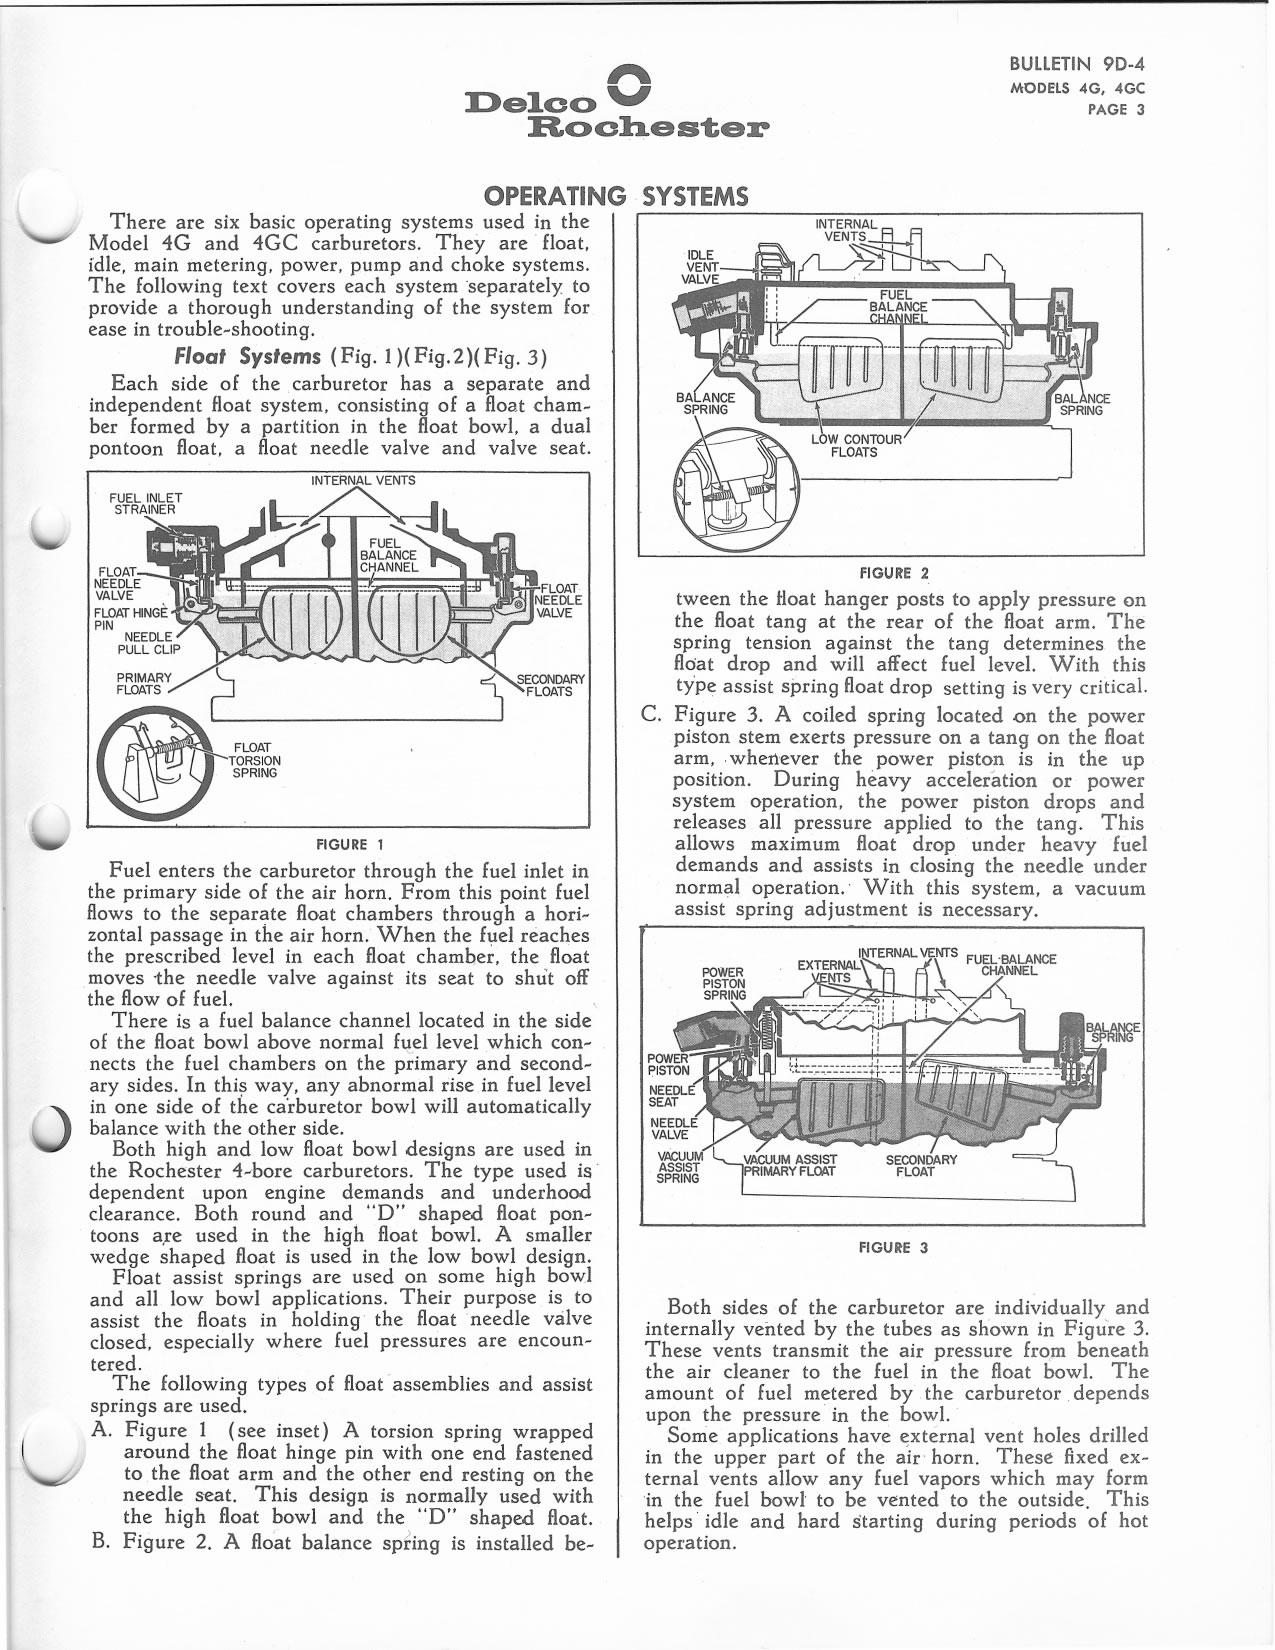 1964 Delco Rochester 4G Service Manual / Roch4G_0003.jpg